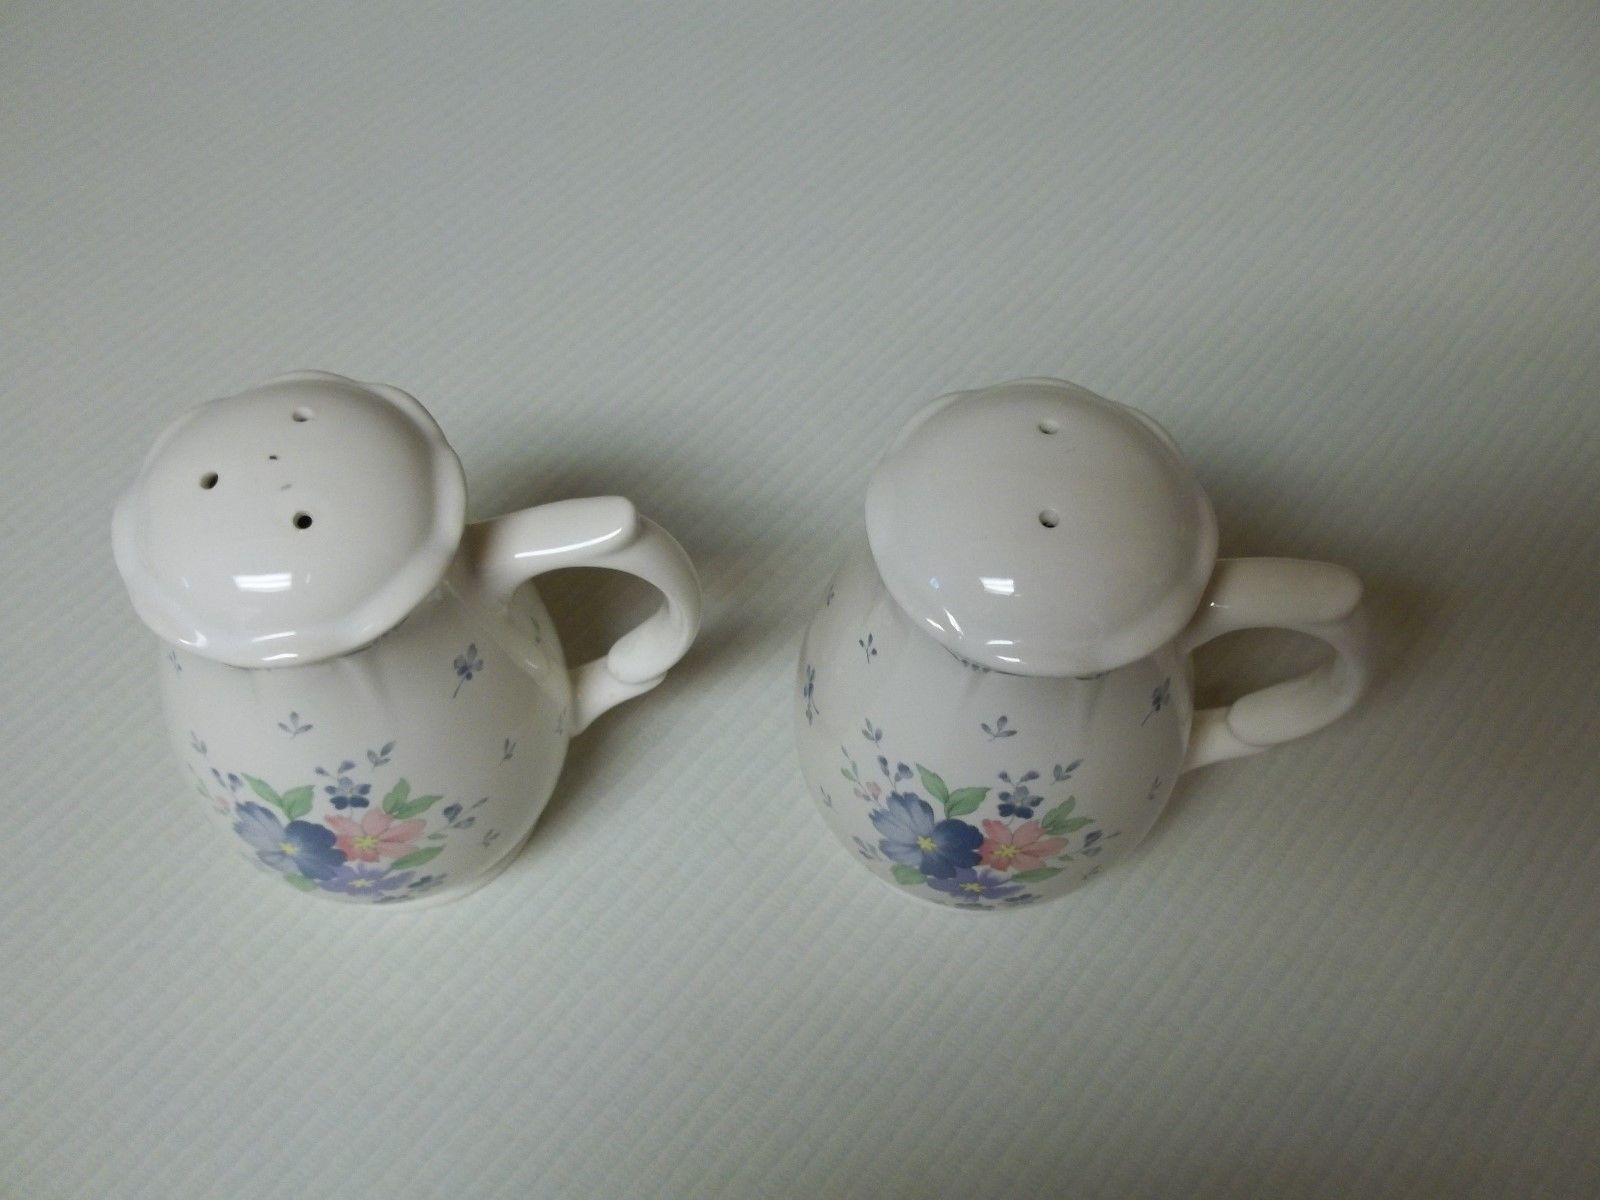 Nikko Japan Dauphine Salt & Pepper Shakers Blue & Flowers Stoneware